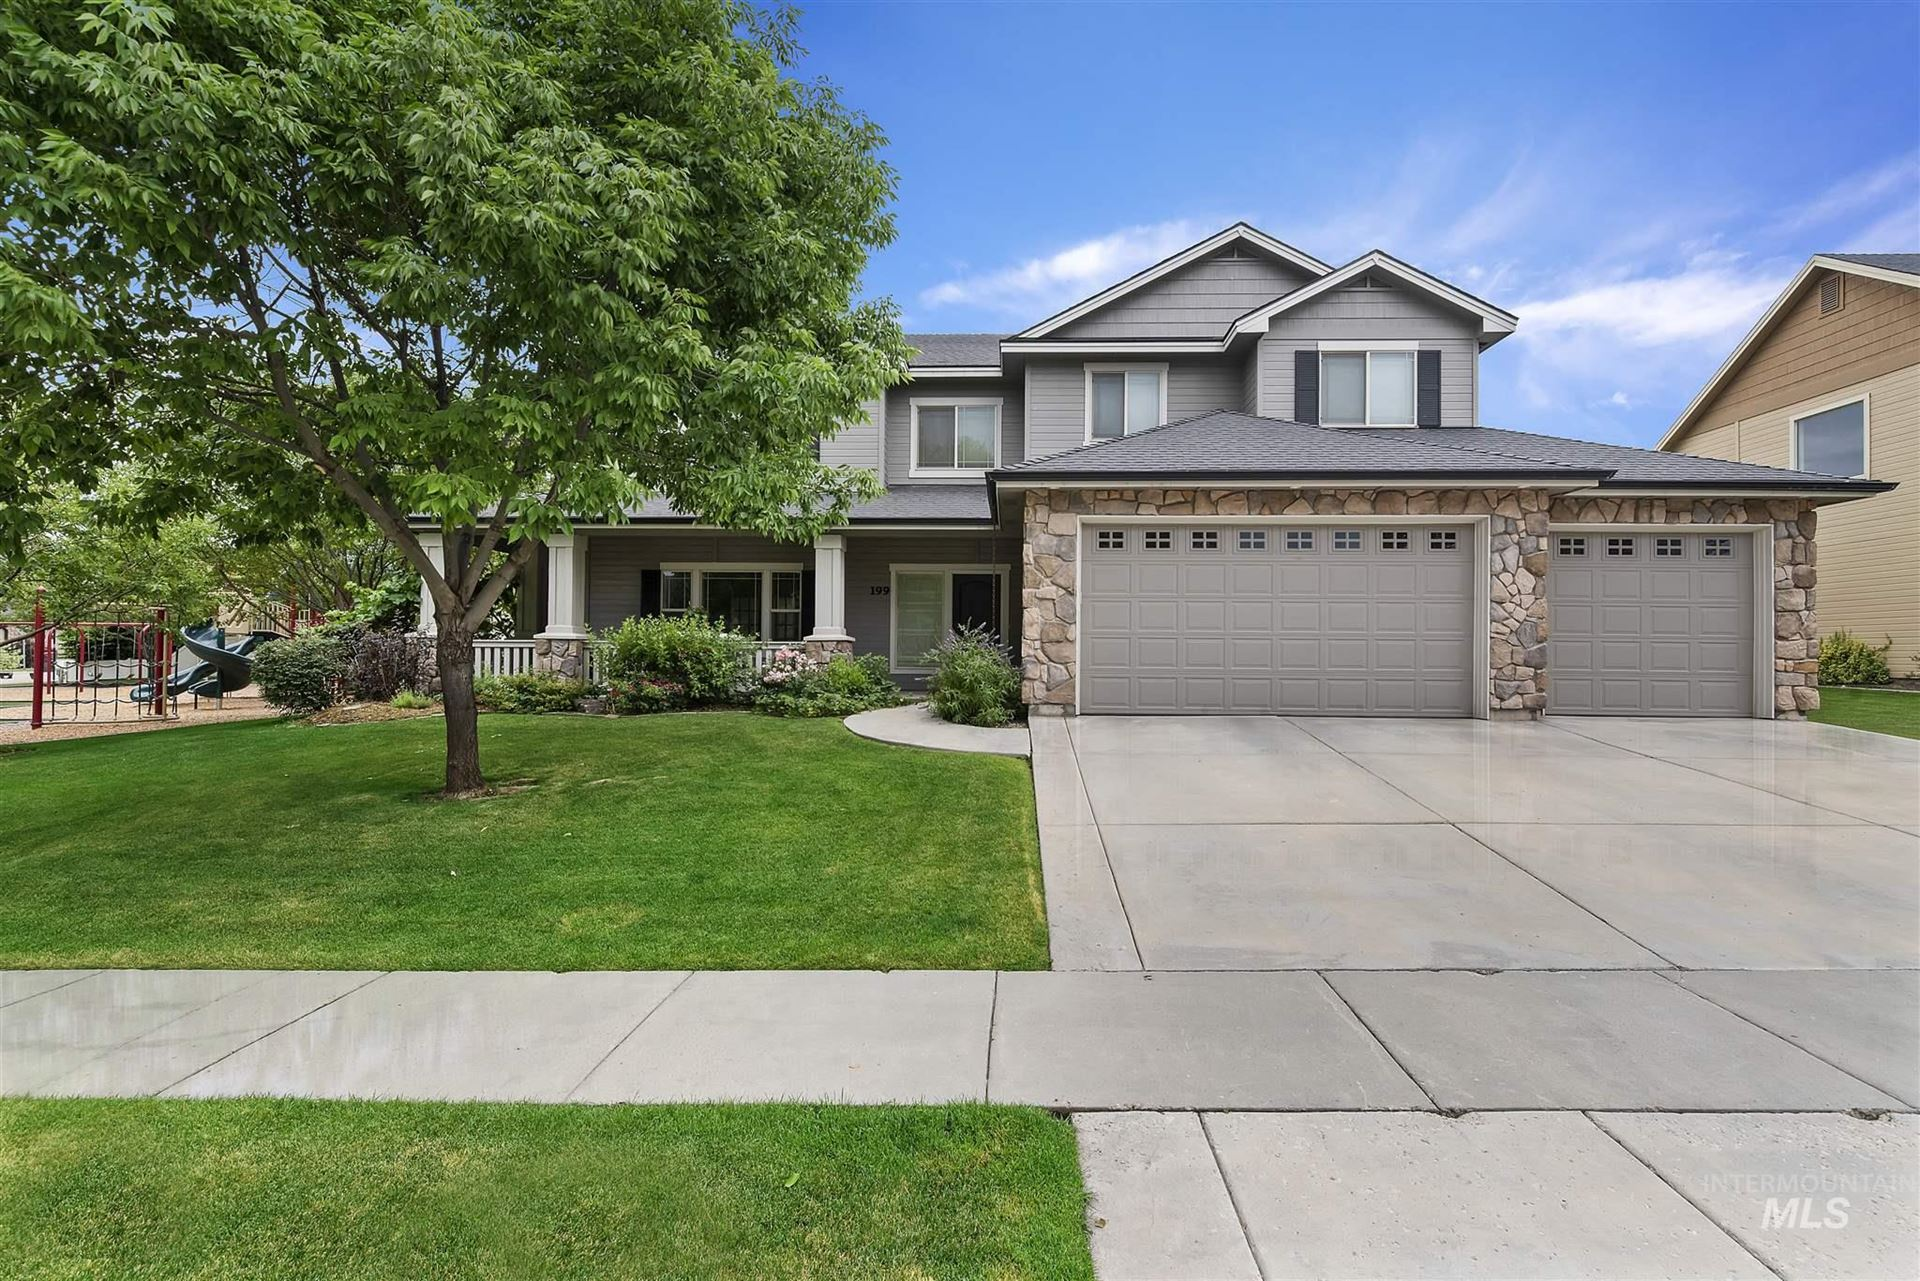 199 W Orso Drive, Meridian, ID 83642 - MLS#: 98775103